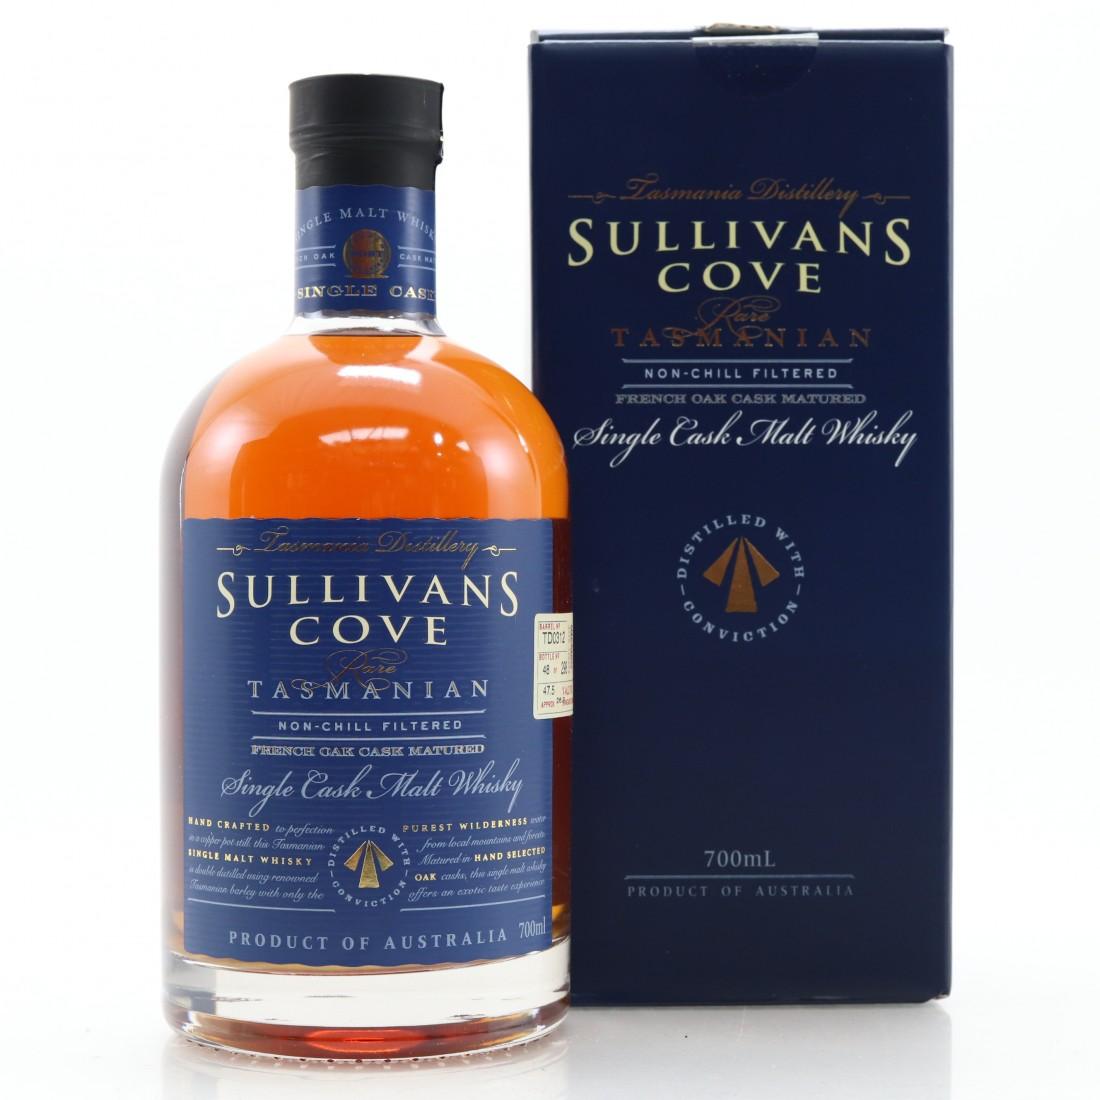 Sullivans Cove 2008 Single French Oak Cask #TD0312